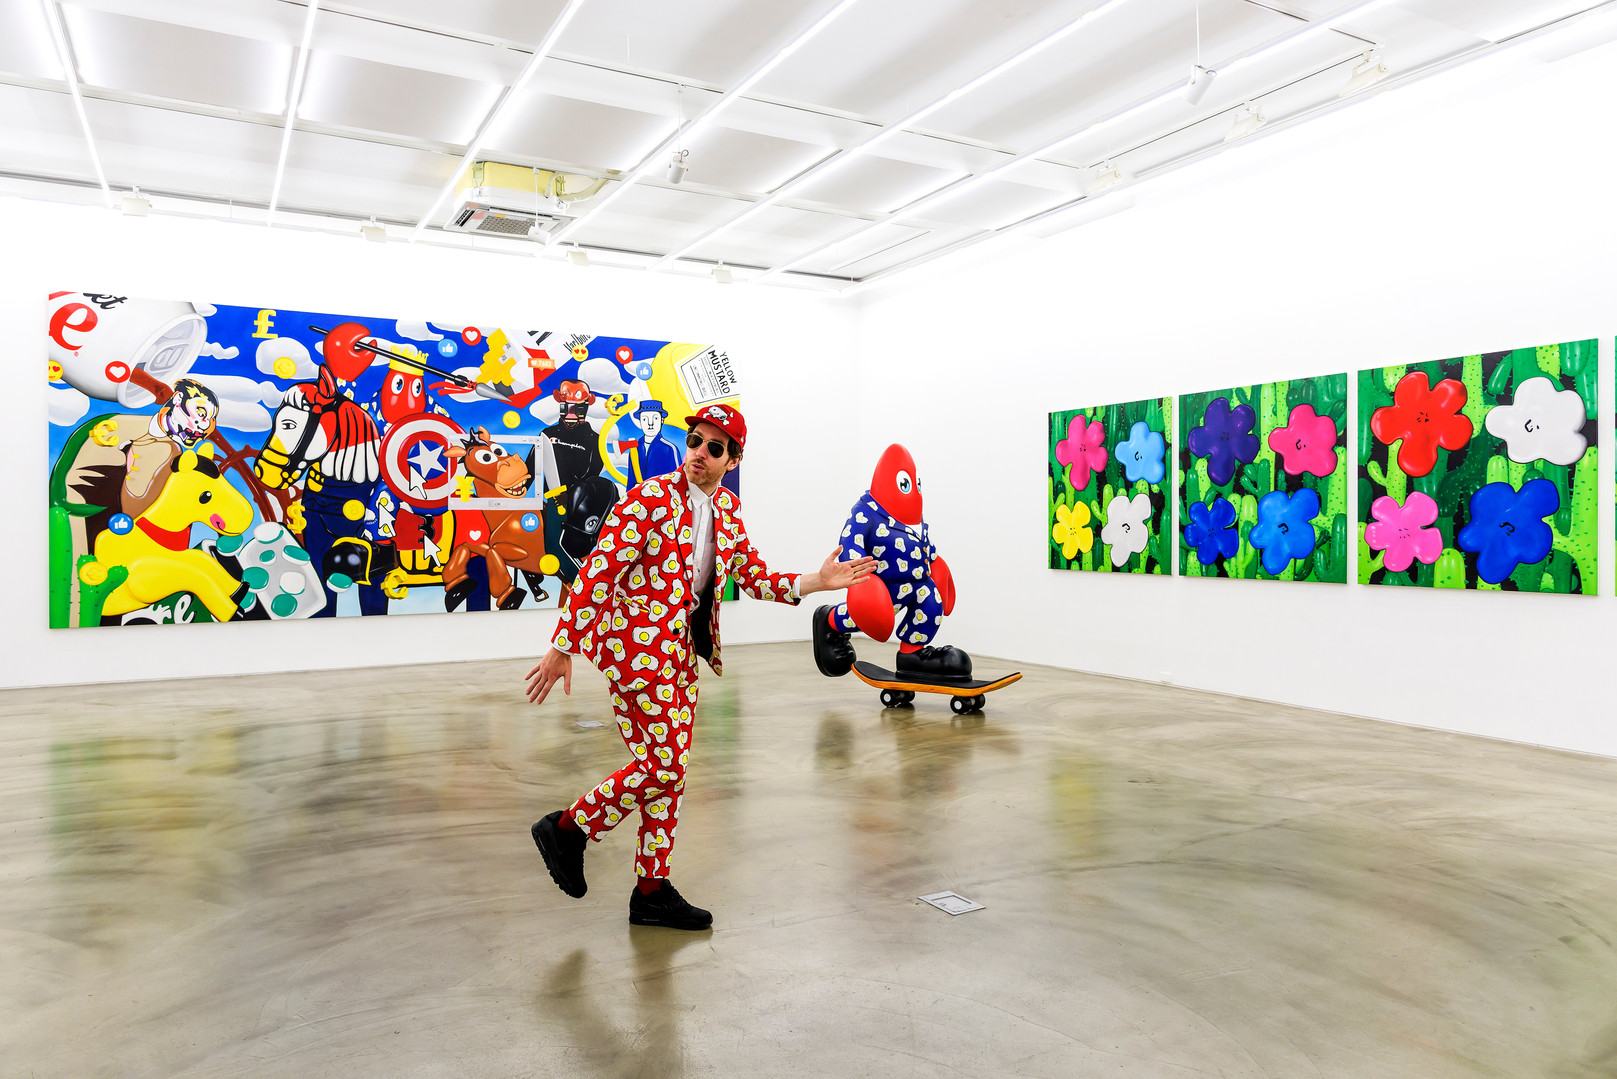 Gallery Simon installation view